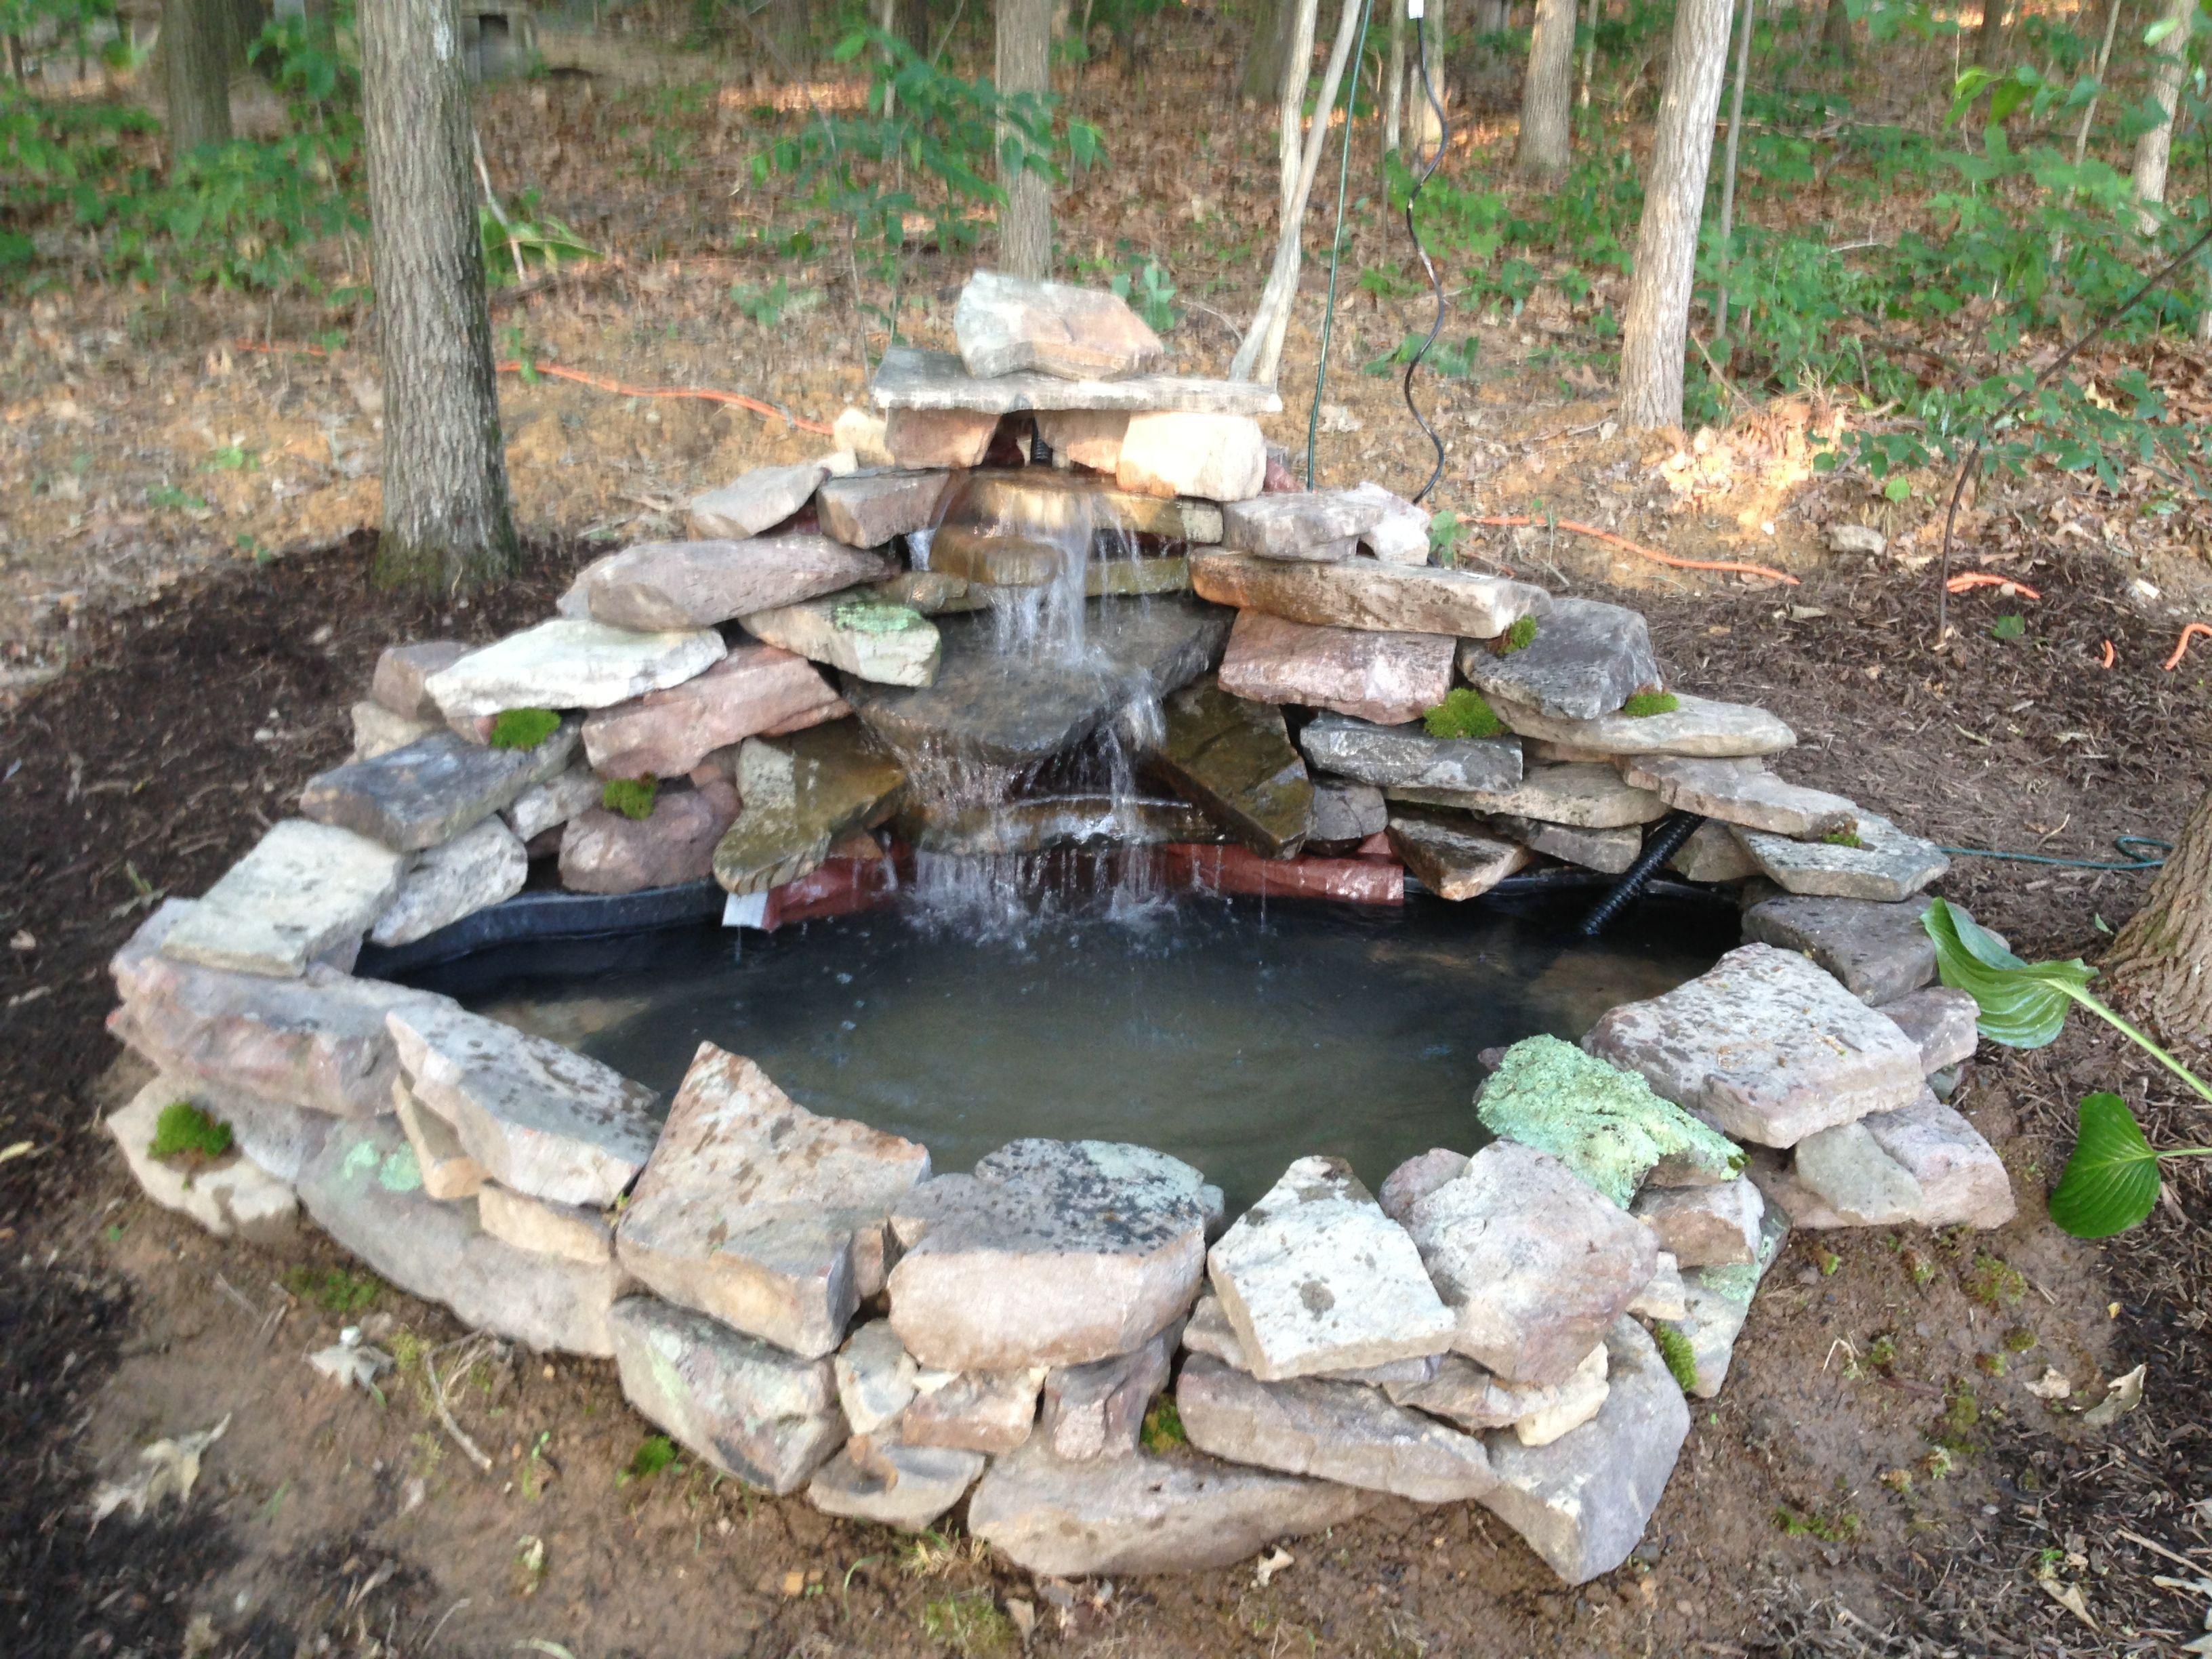 a 125 gallon pre form pond with 800 gallon per hour pump creating a